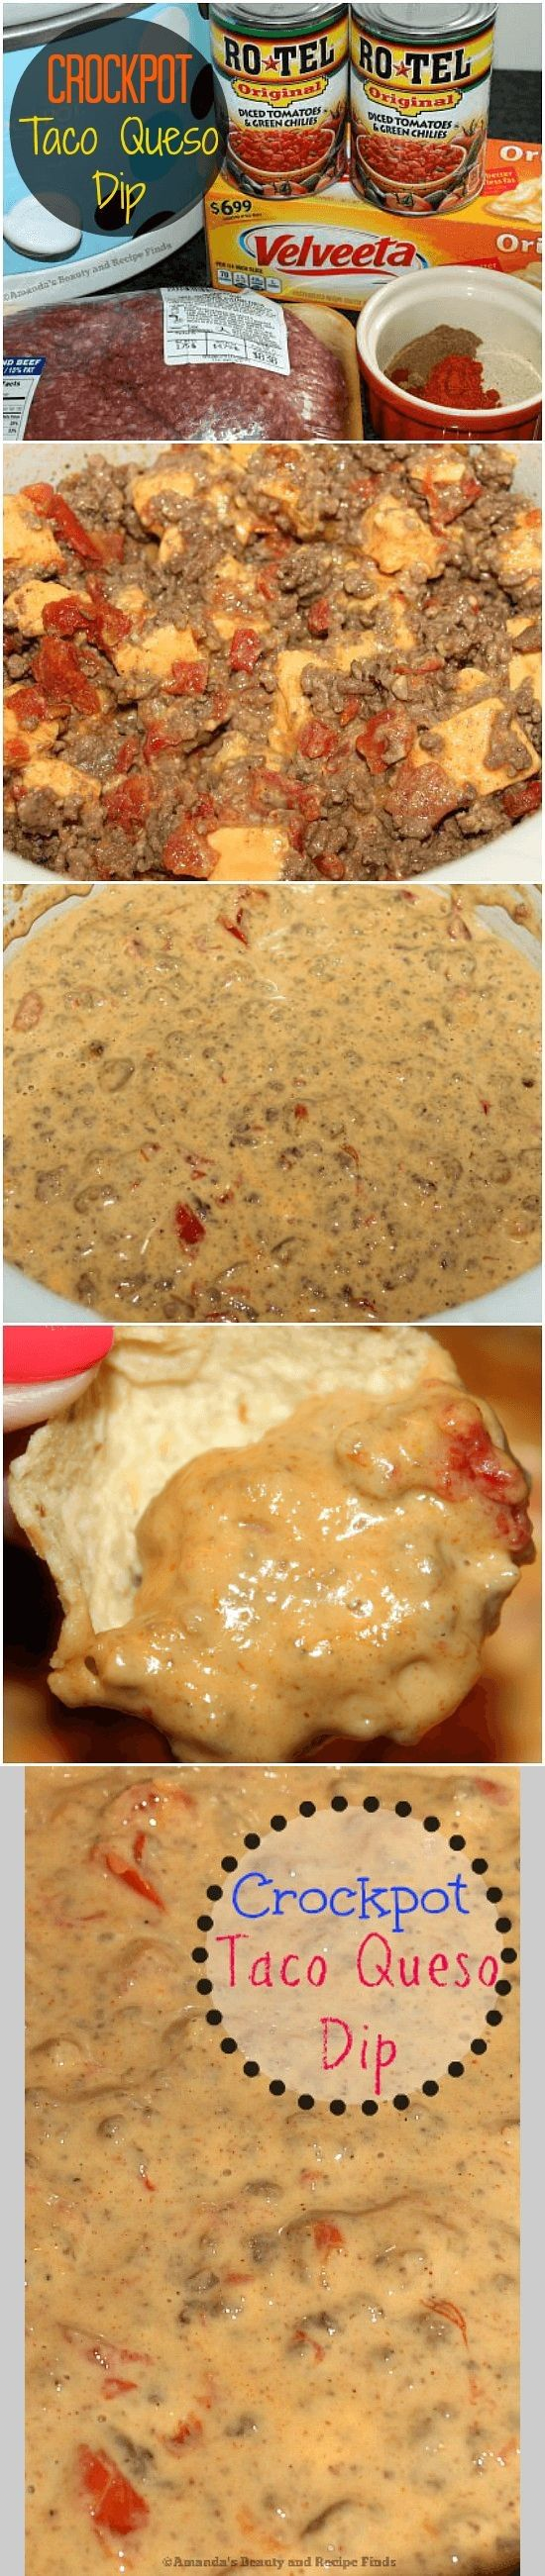 1 1/2 lbs Ground beef. 2 tsp Garlic powder. 2 tsp Onion powder. 1 tsp Cayenne pepper. 1 tsp Paprika. 1/2 tbsp Cumin. 32 oz Velveeta. 2 cans Of original rotel.